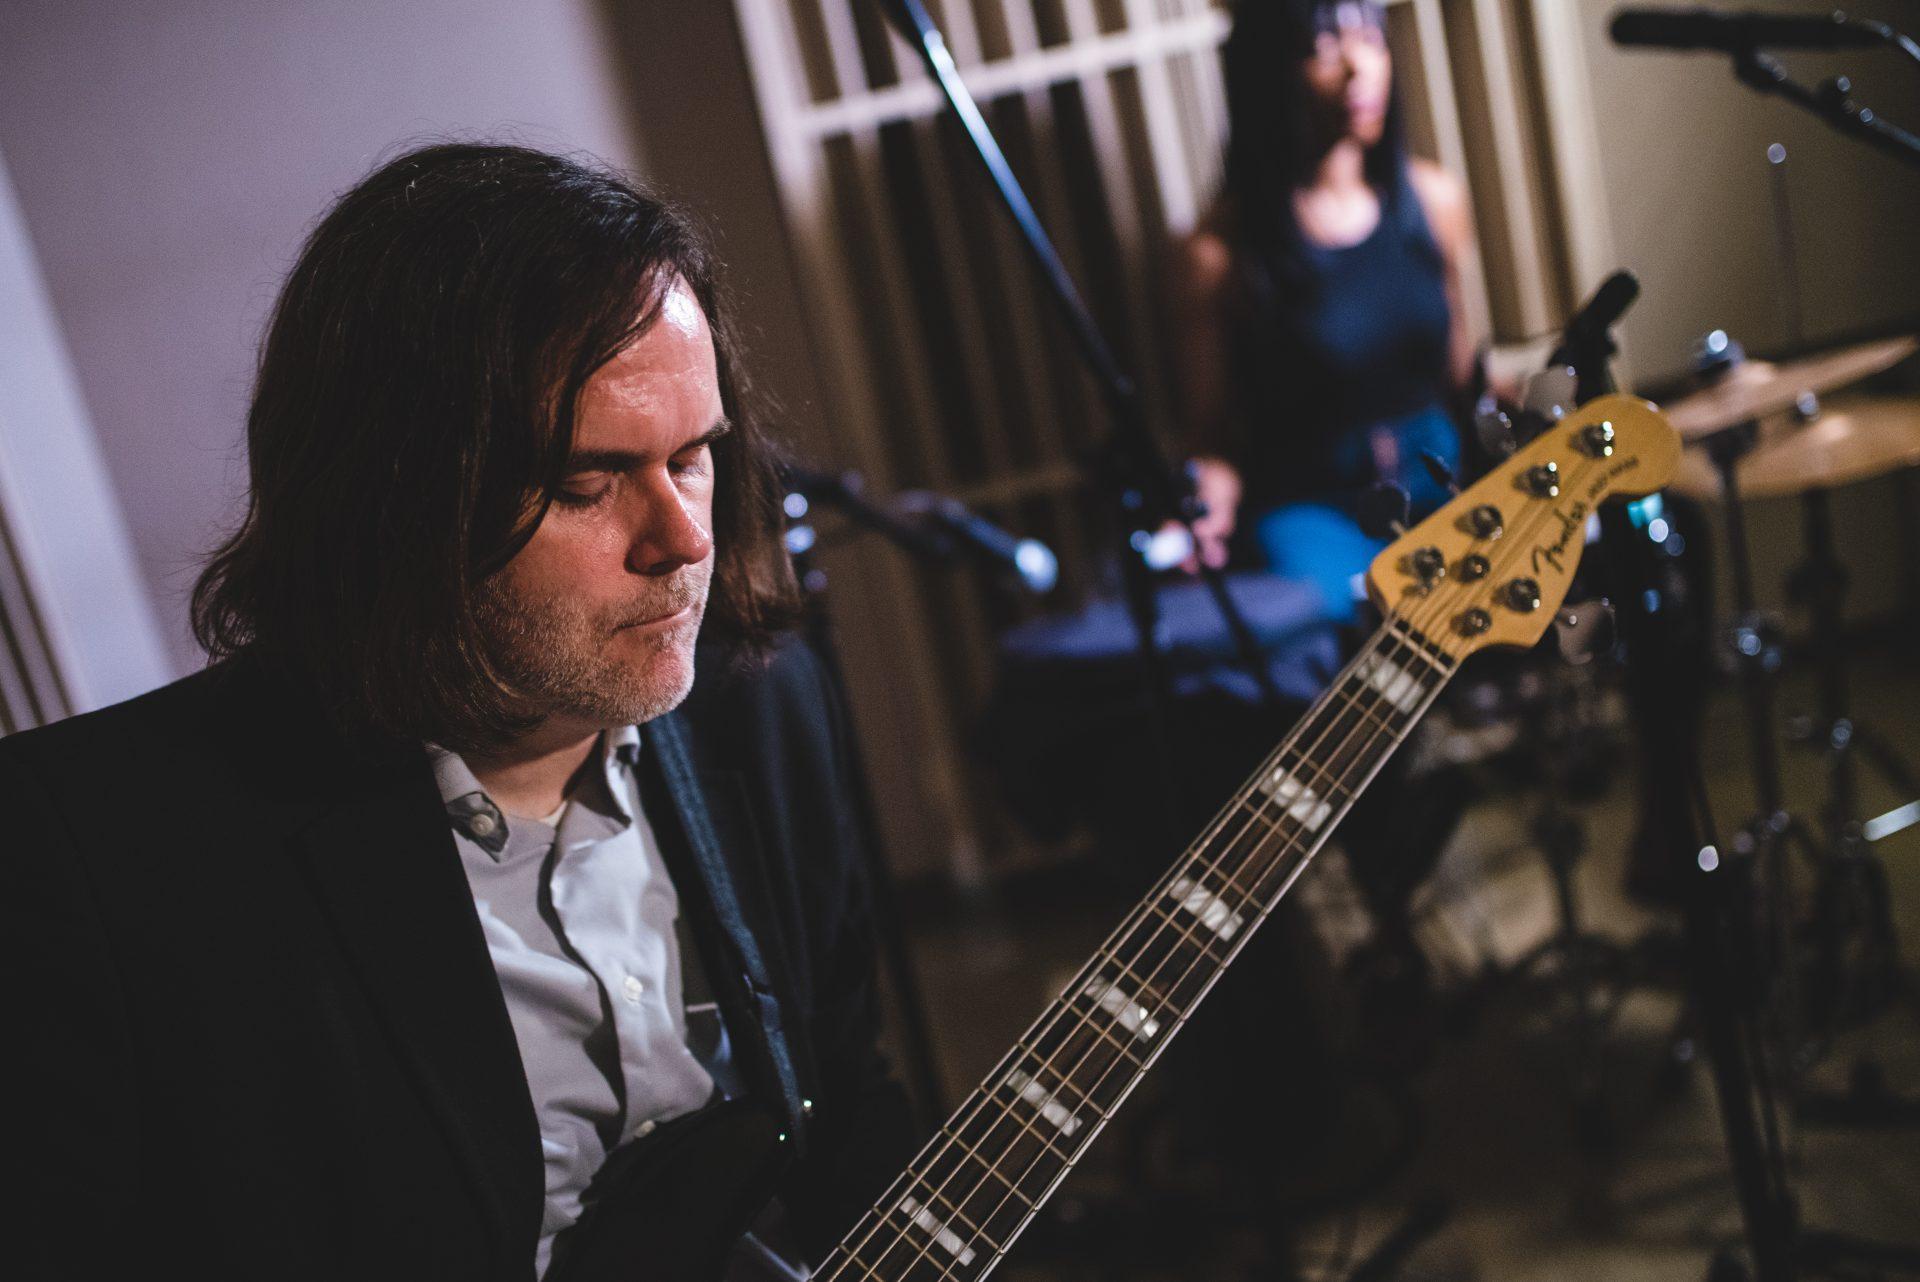 Bassist Jason Rafalak performing.